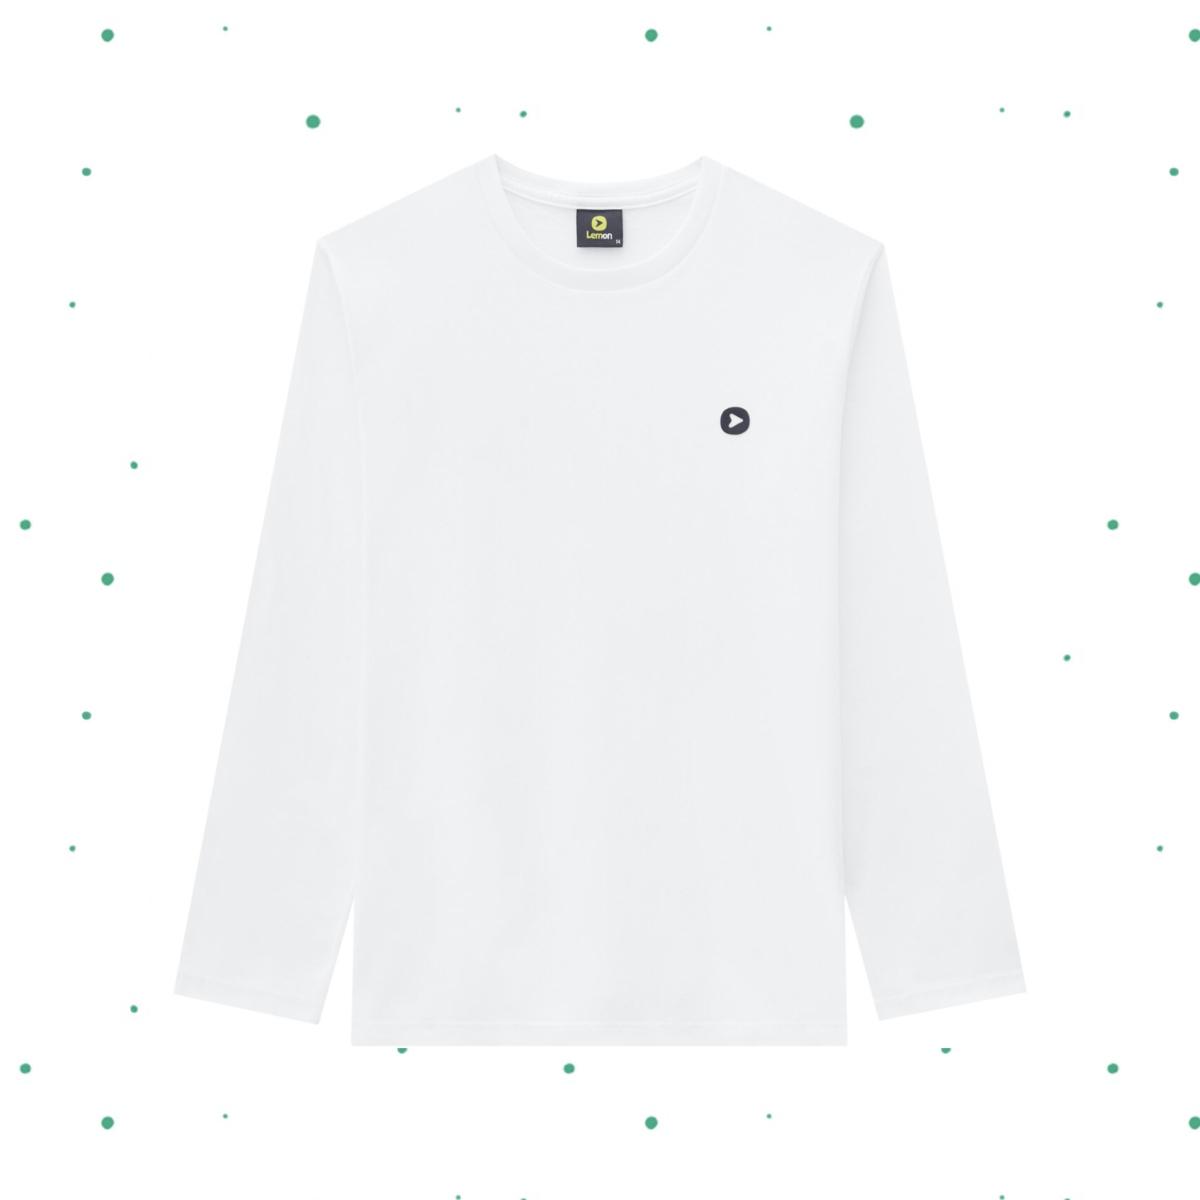 Camiseta Manga Longa Teen Lemon em Algodão cor Branca